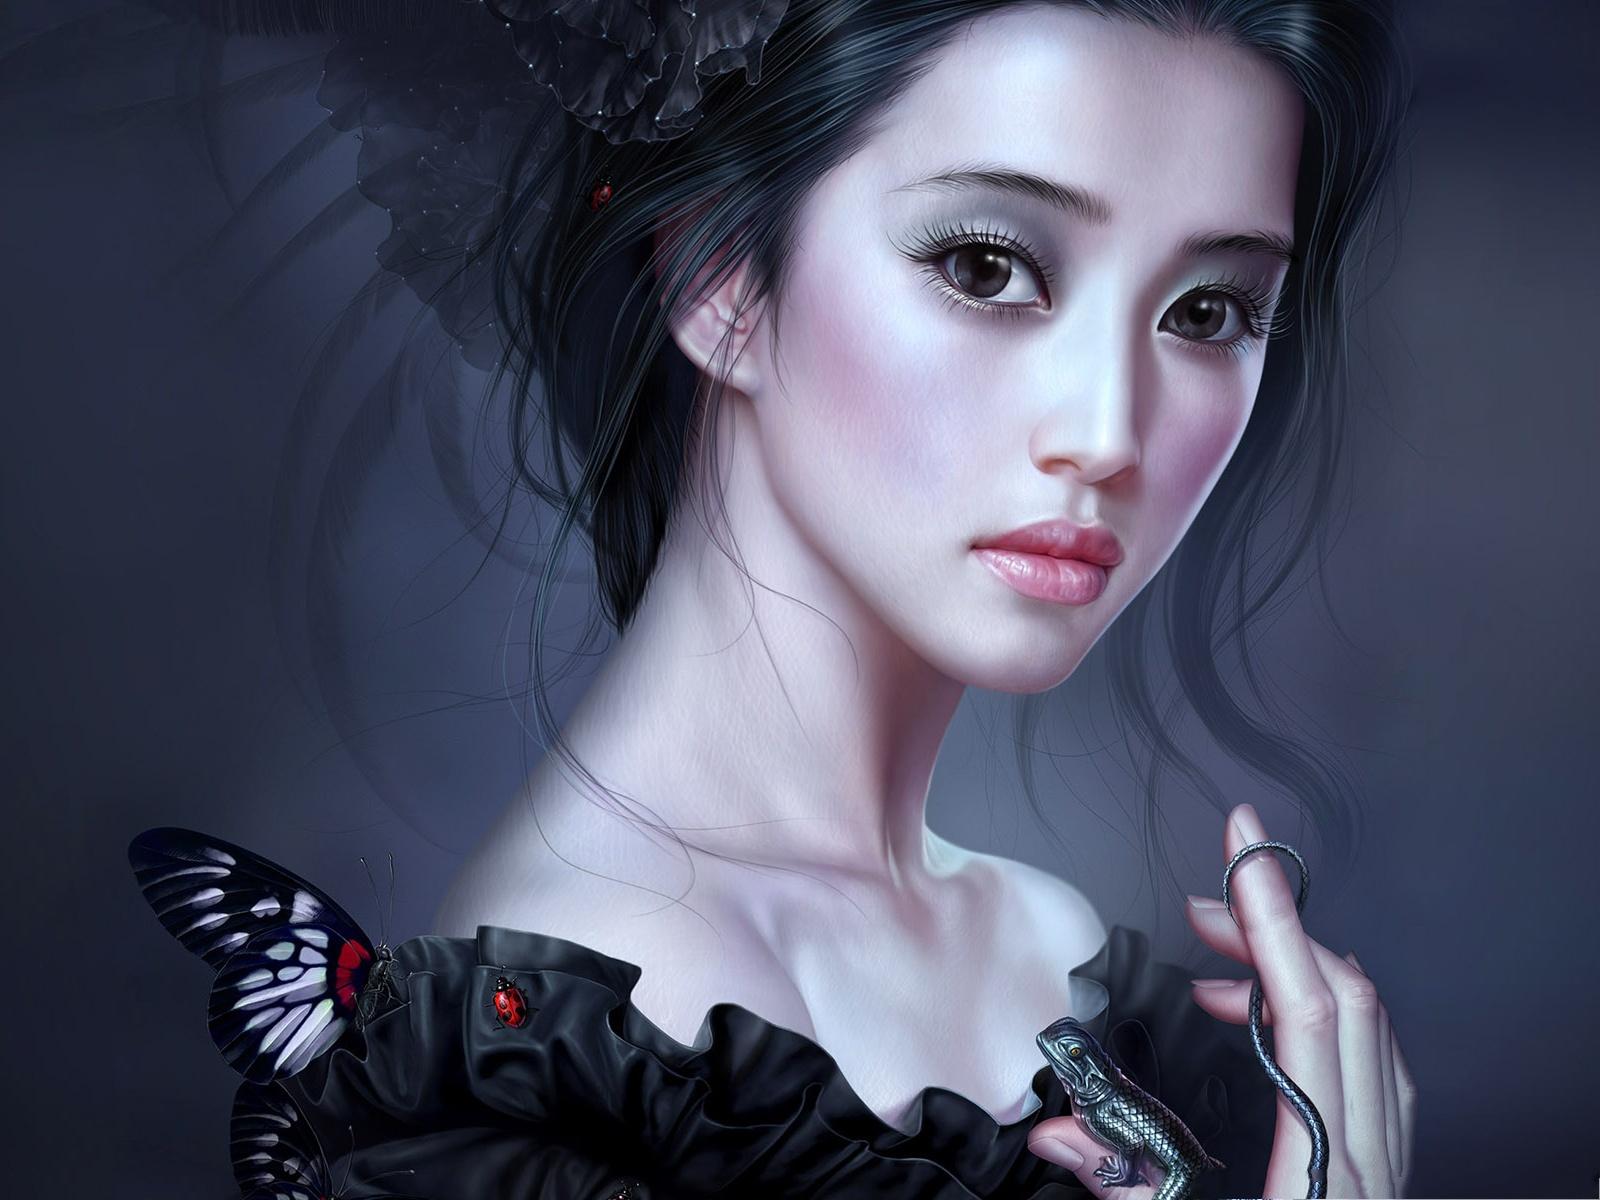 Beautiful Girl Wallpaper Young Girl In Black Painting